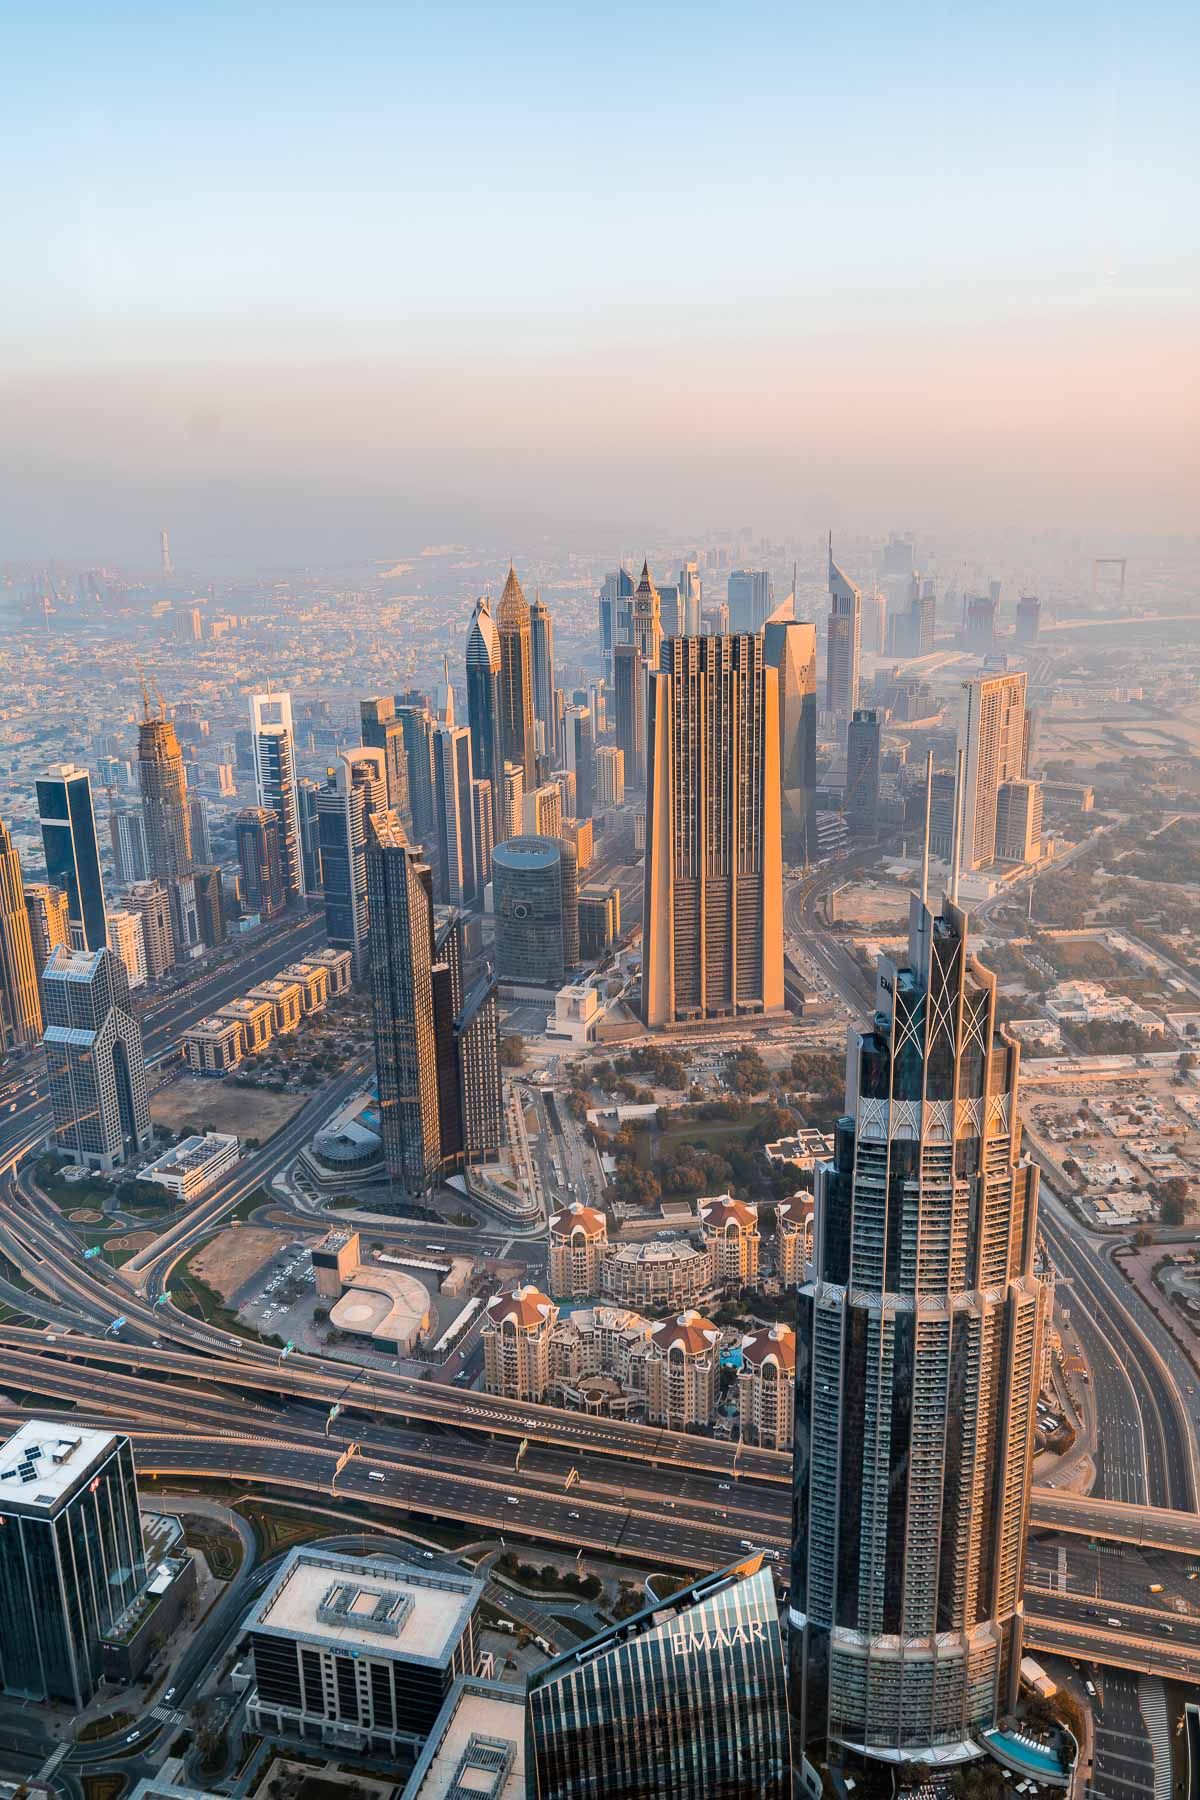 View of the Dubai skyline from the Burj Khalifa at sunrise